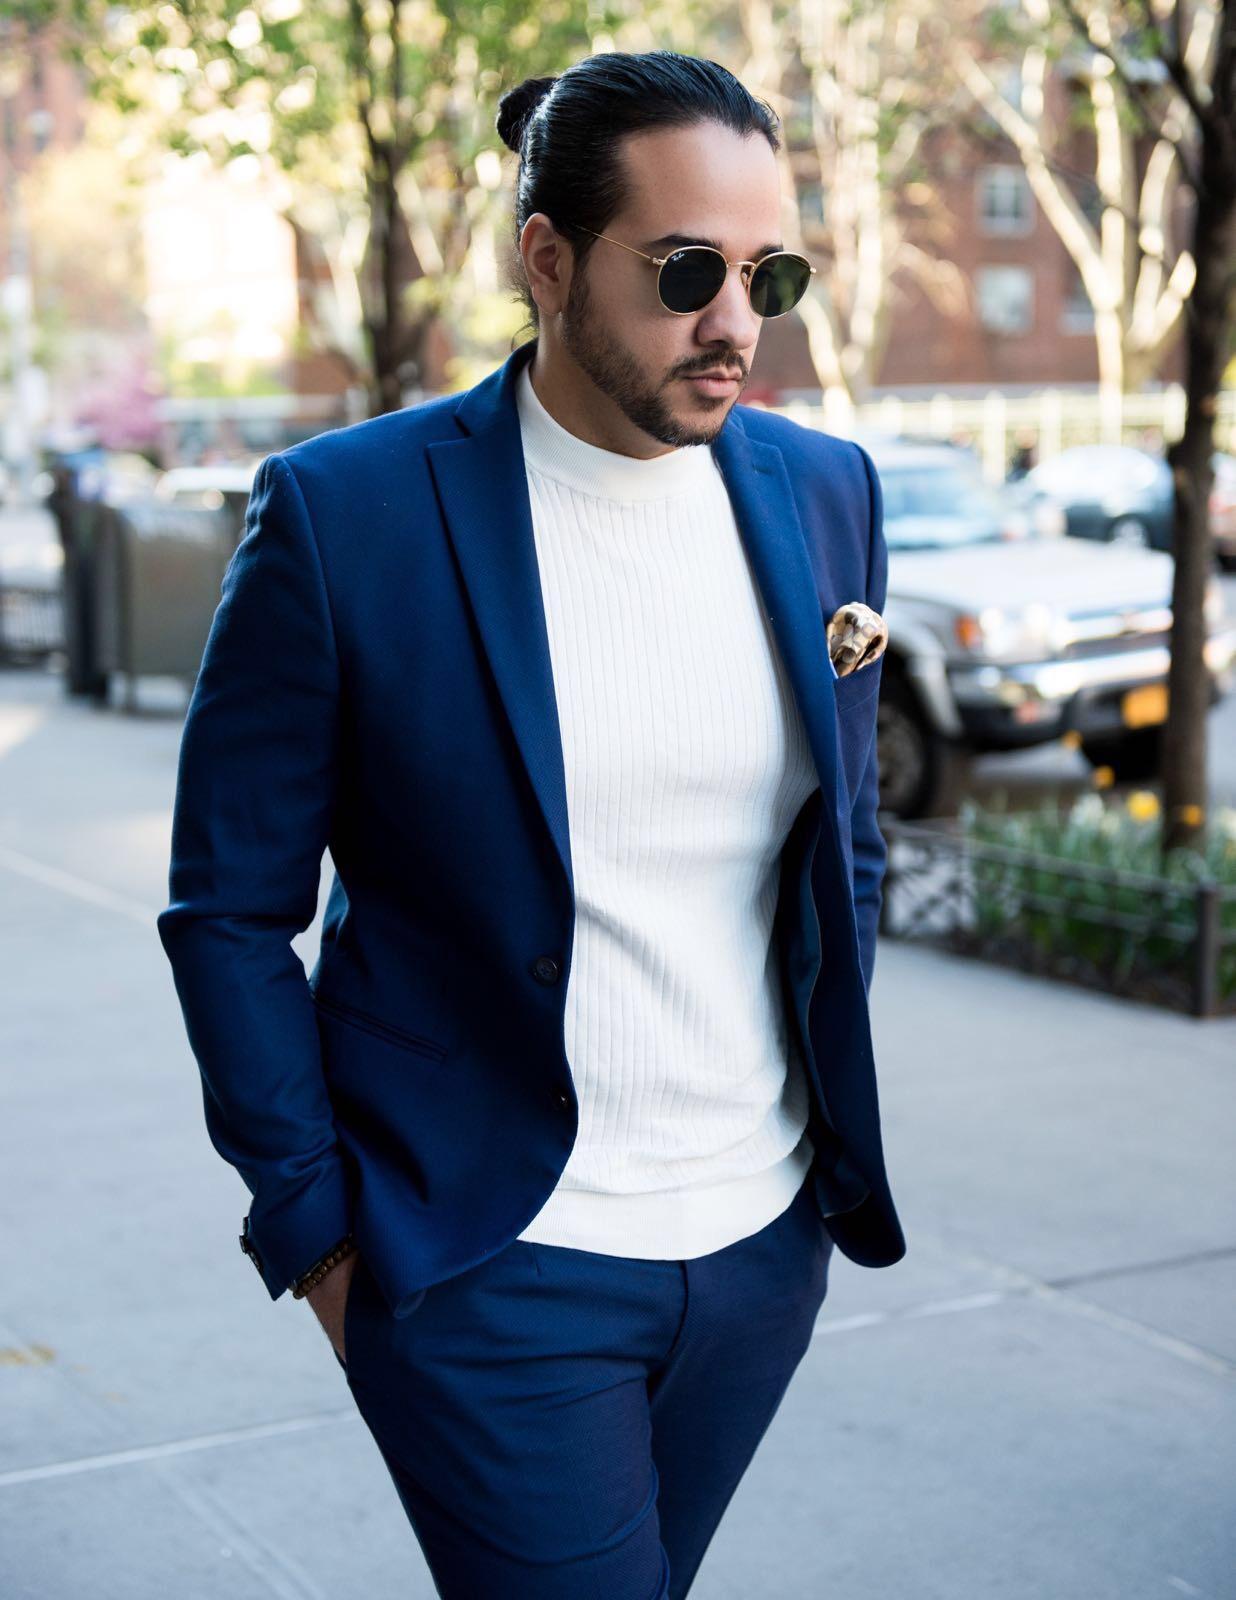 Navy Blue Suit4.JPG